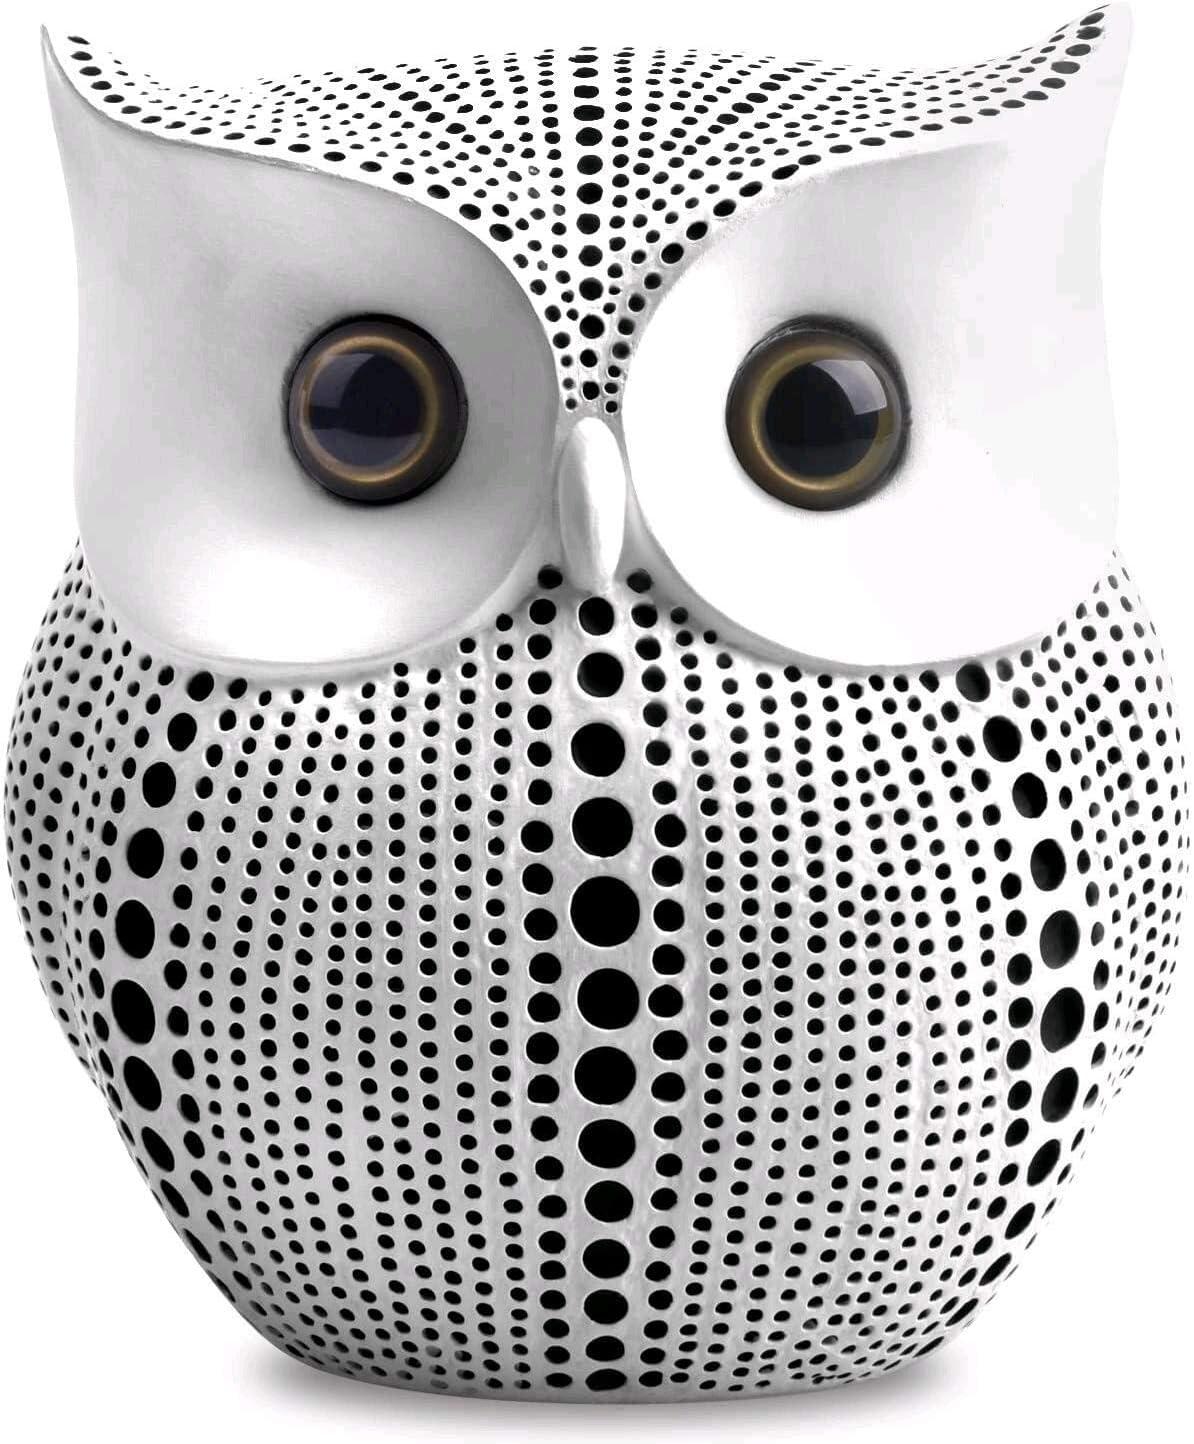 Owl Statues Office Decor - Owls Shelf Decor for Living Room Bathroom Bedroom Office Figurines White Owl Gifts for Women Men or Bird Lover,3.1